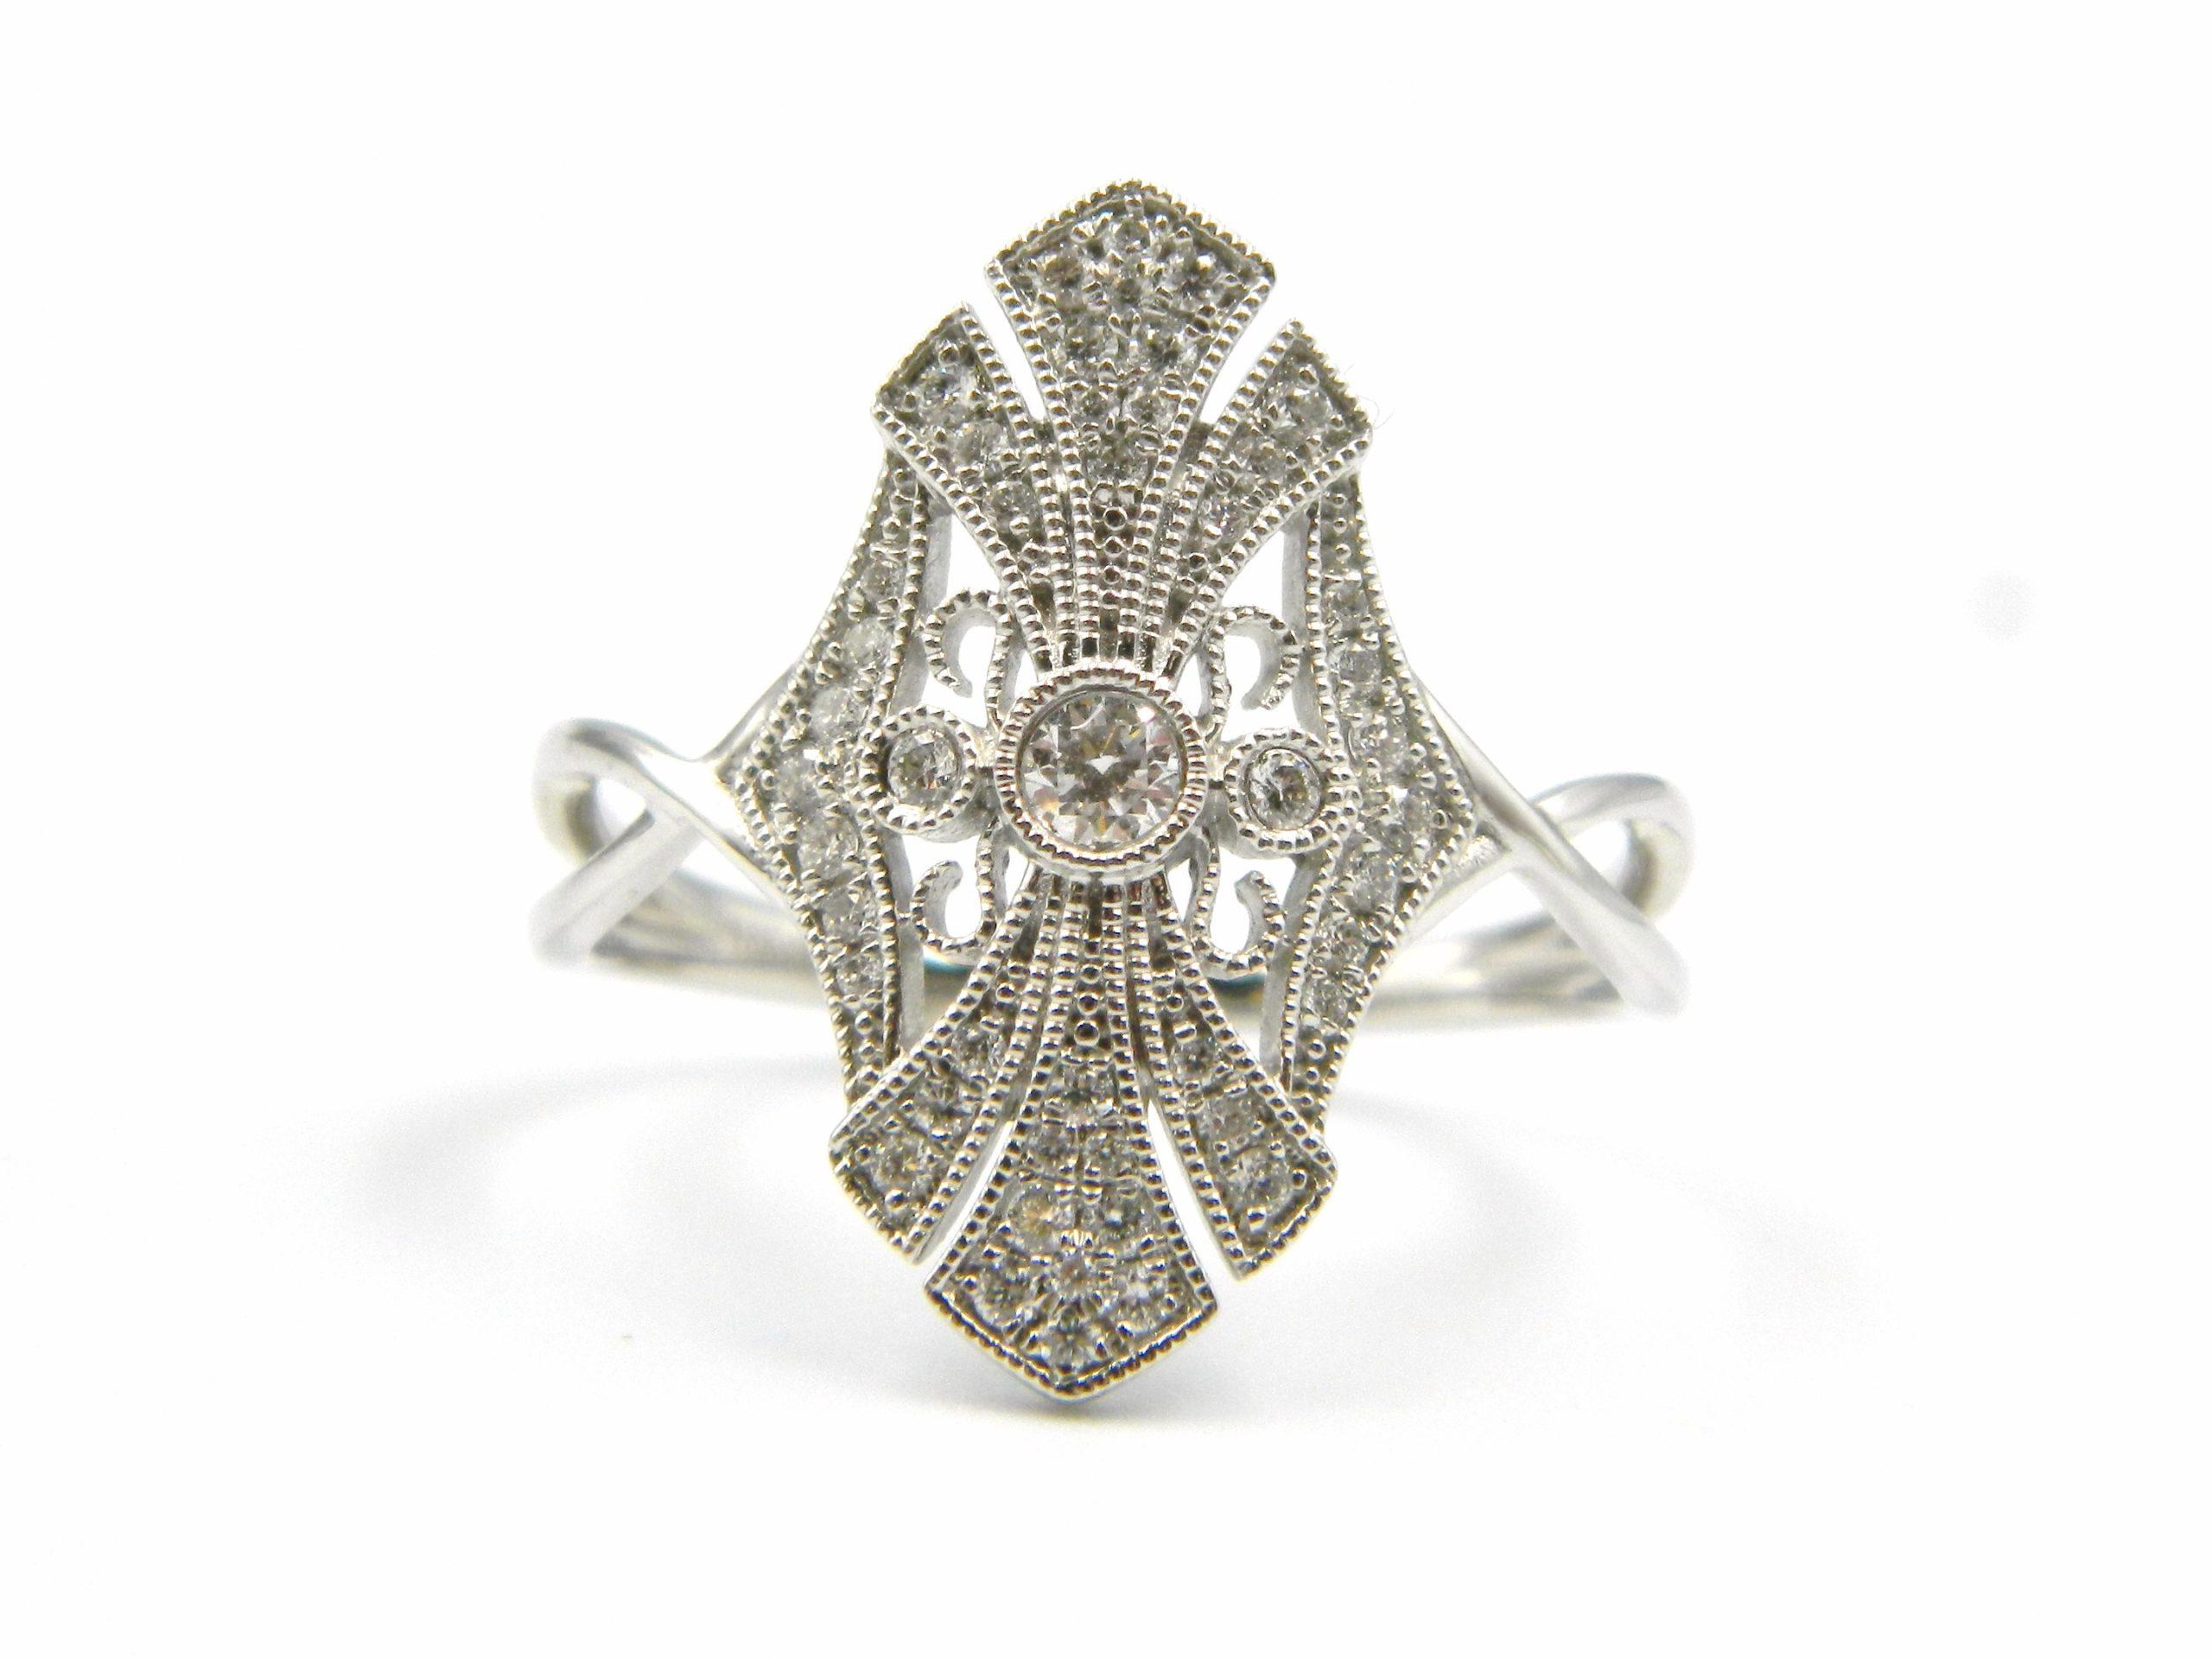 White Gold Antique-Inspired Diamond Ring